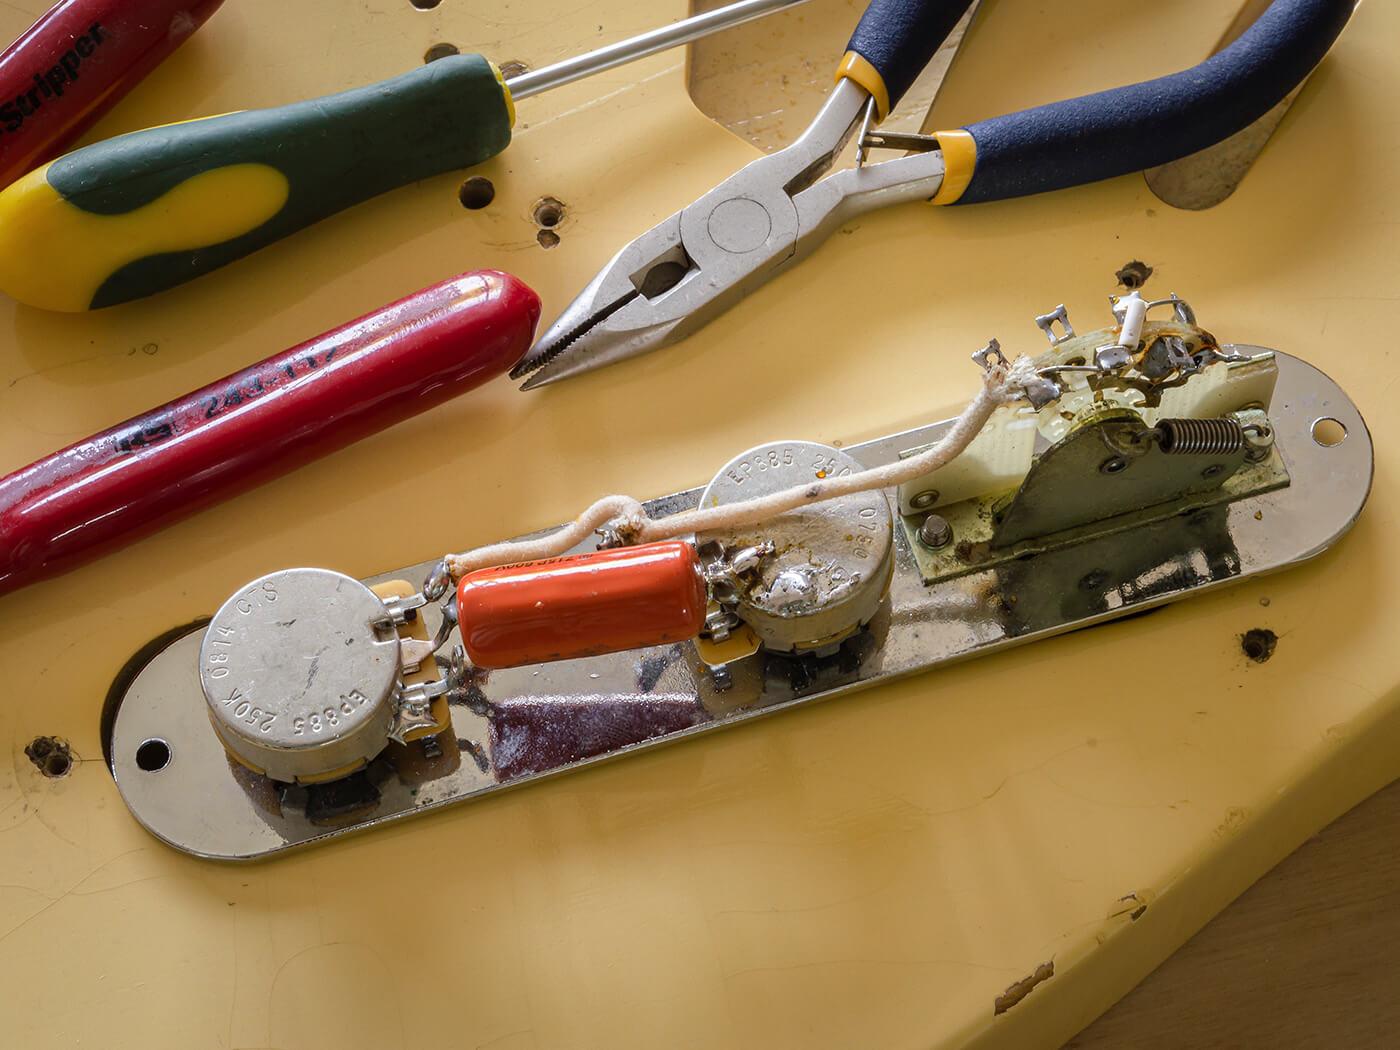 DIY Workshop: Telecaster to Esquire Conversion 2